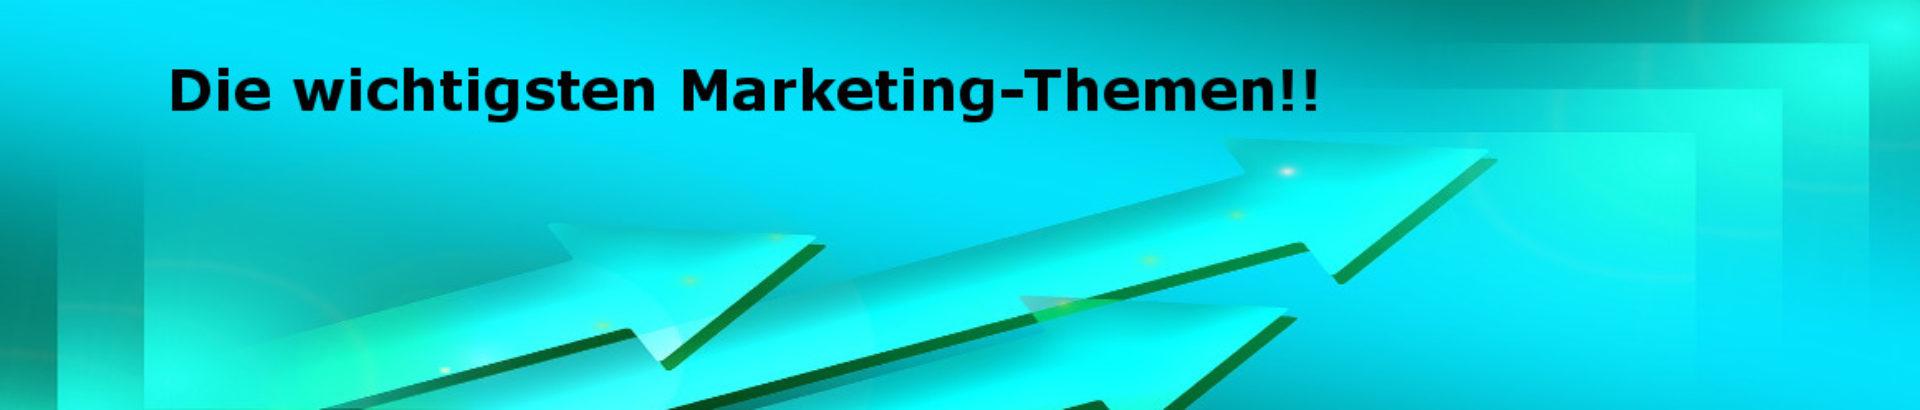 Digitale Marketing -Trends